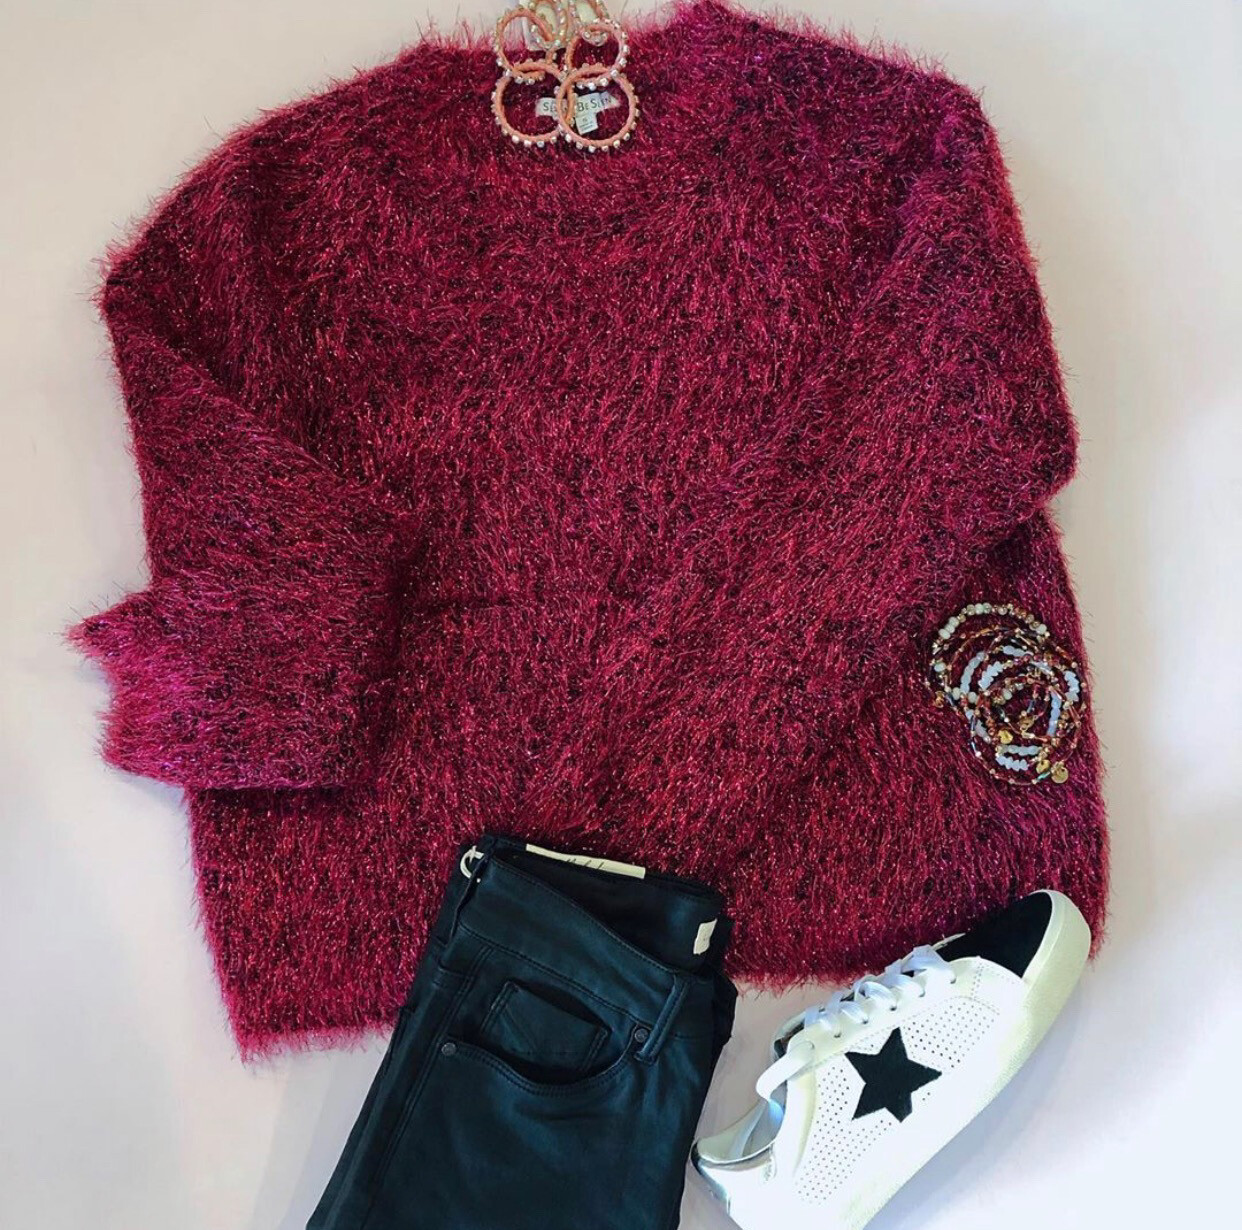 Magenta Shimmer Pull Over Sweater